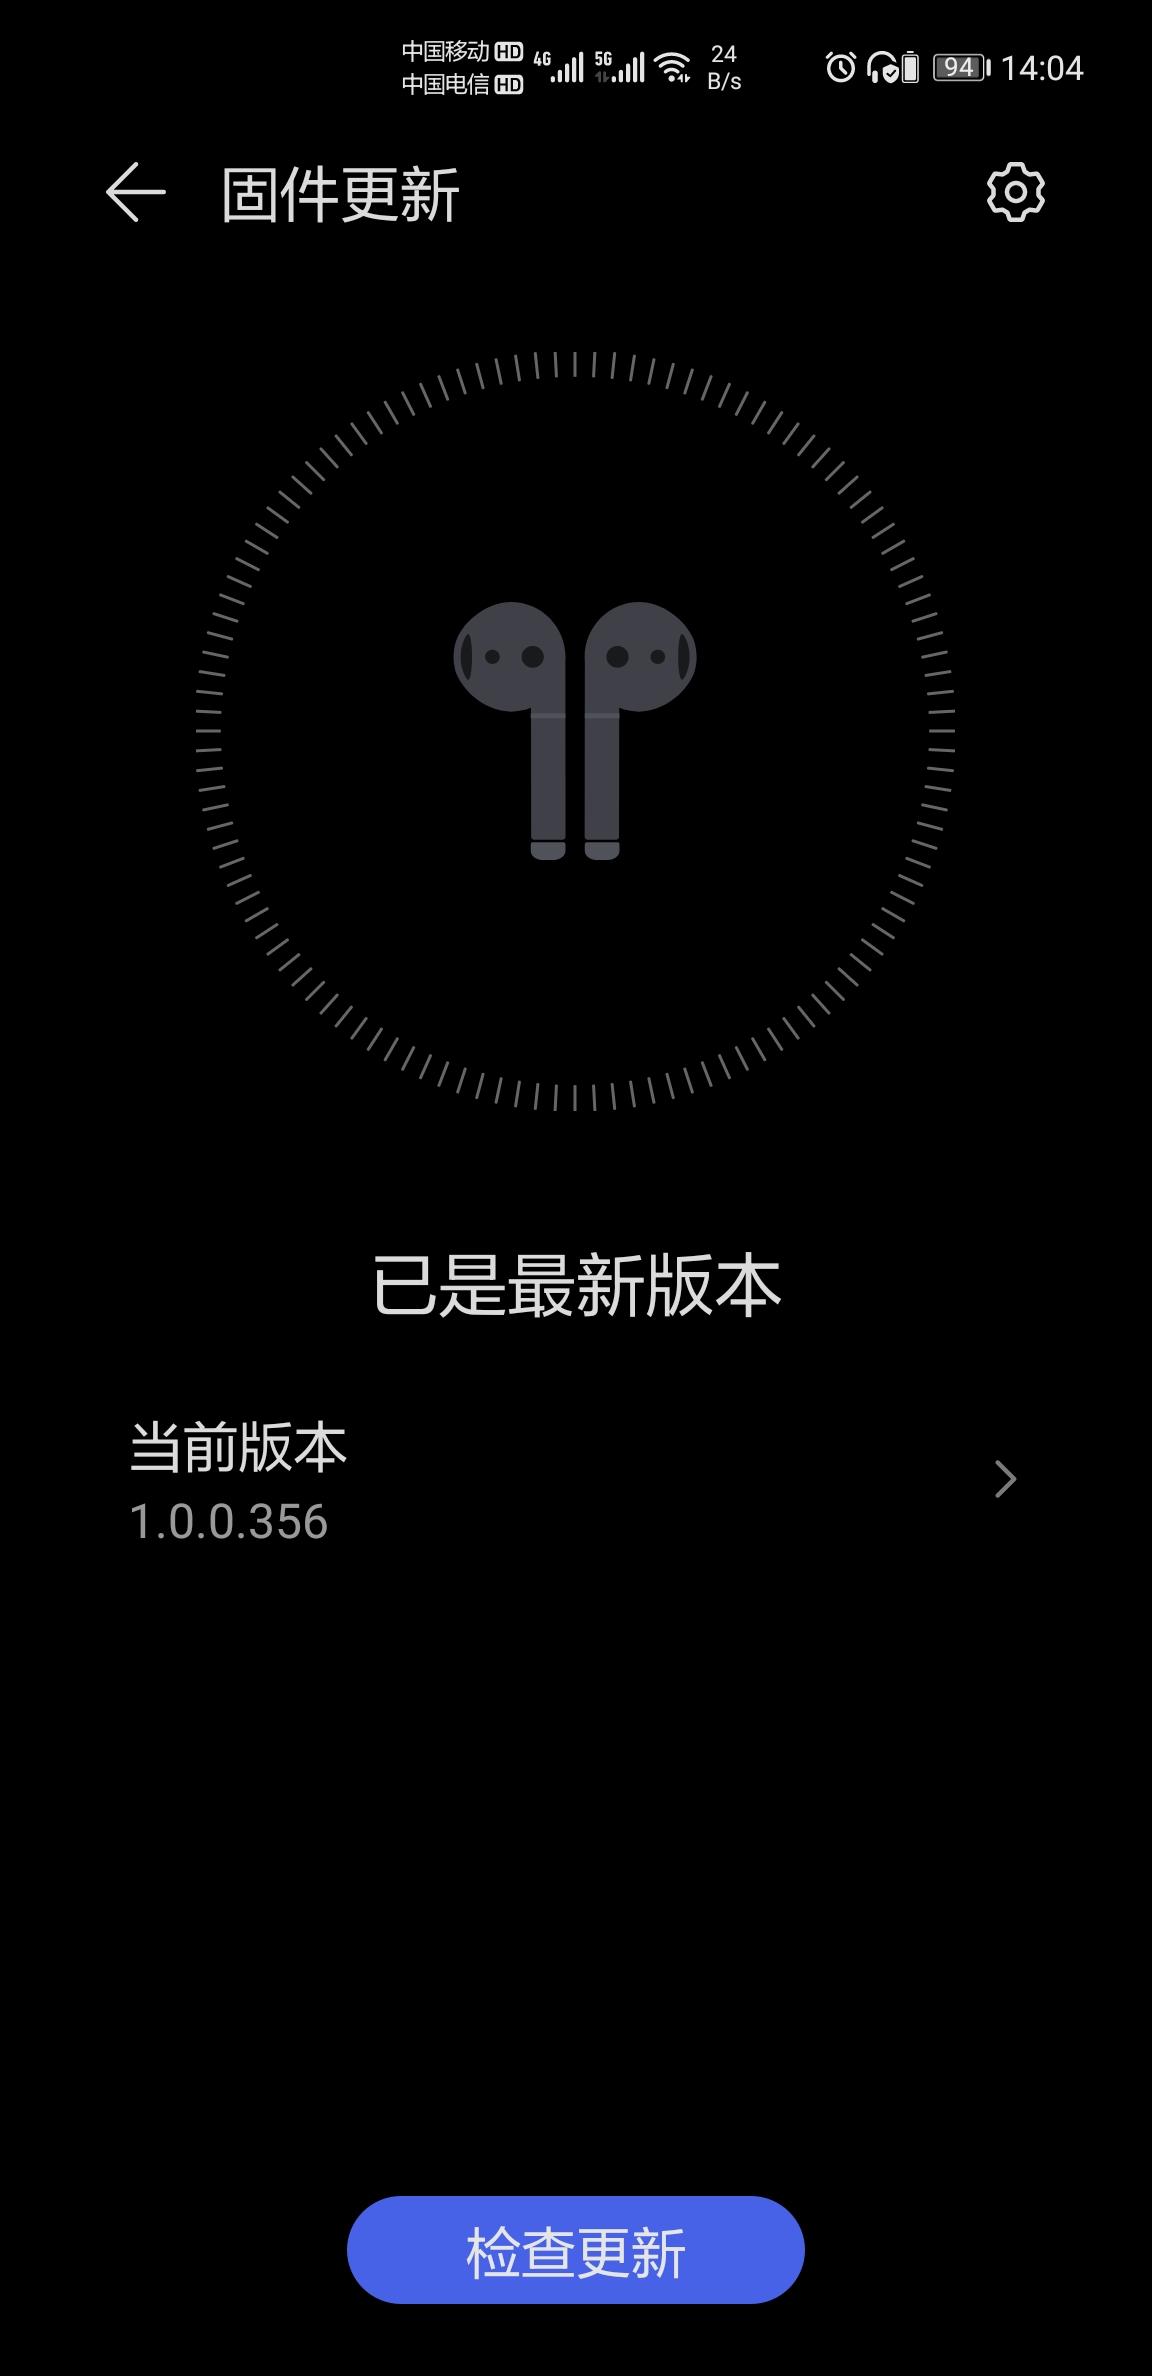 Screenshot_20210329_140431_com.huawei.android.hwouc.jpg